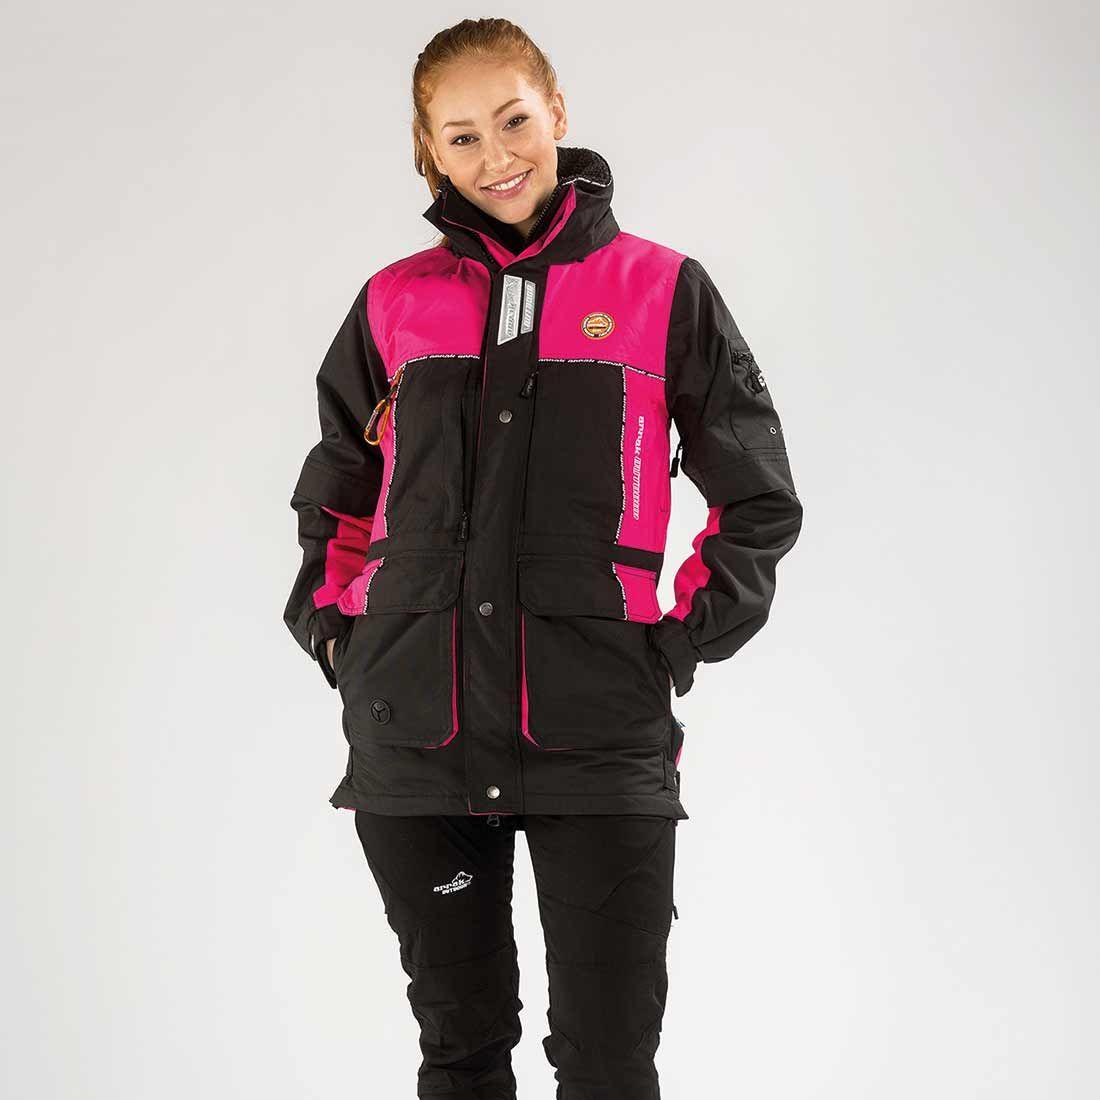 Arrak New Original Jacket Pink/Black XXL